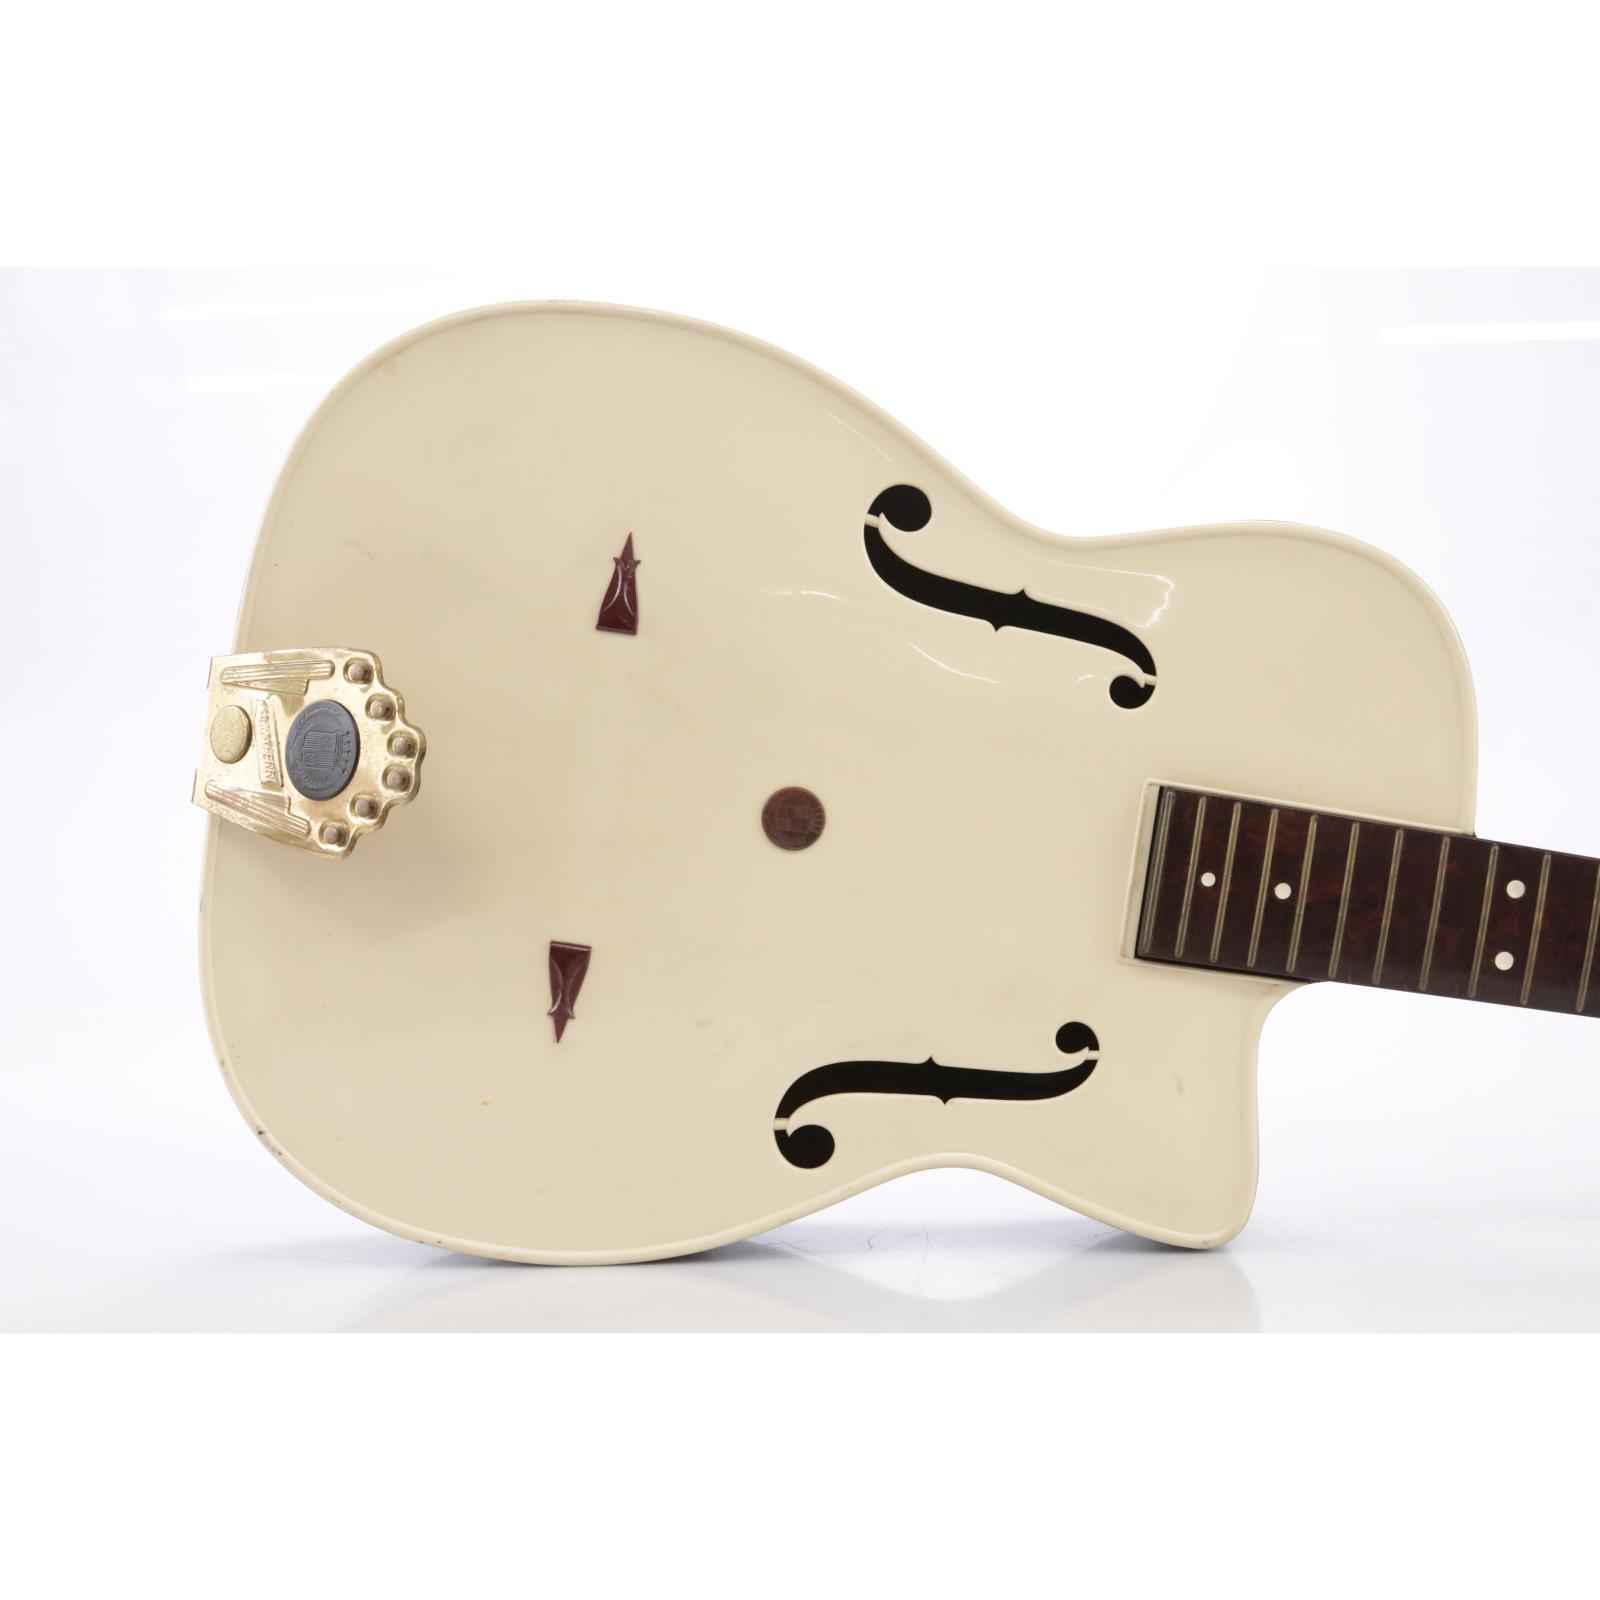 Maccaferri G40 Acoustic Guitar w/ Fender Soft Case #43823